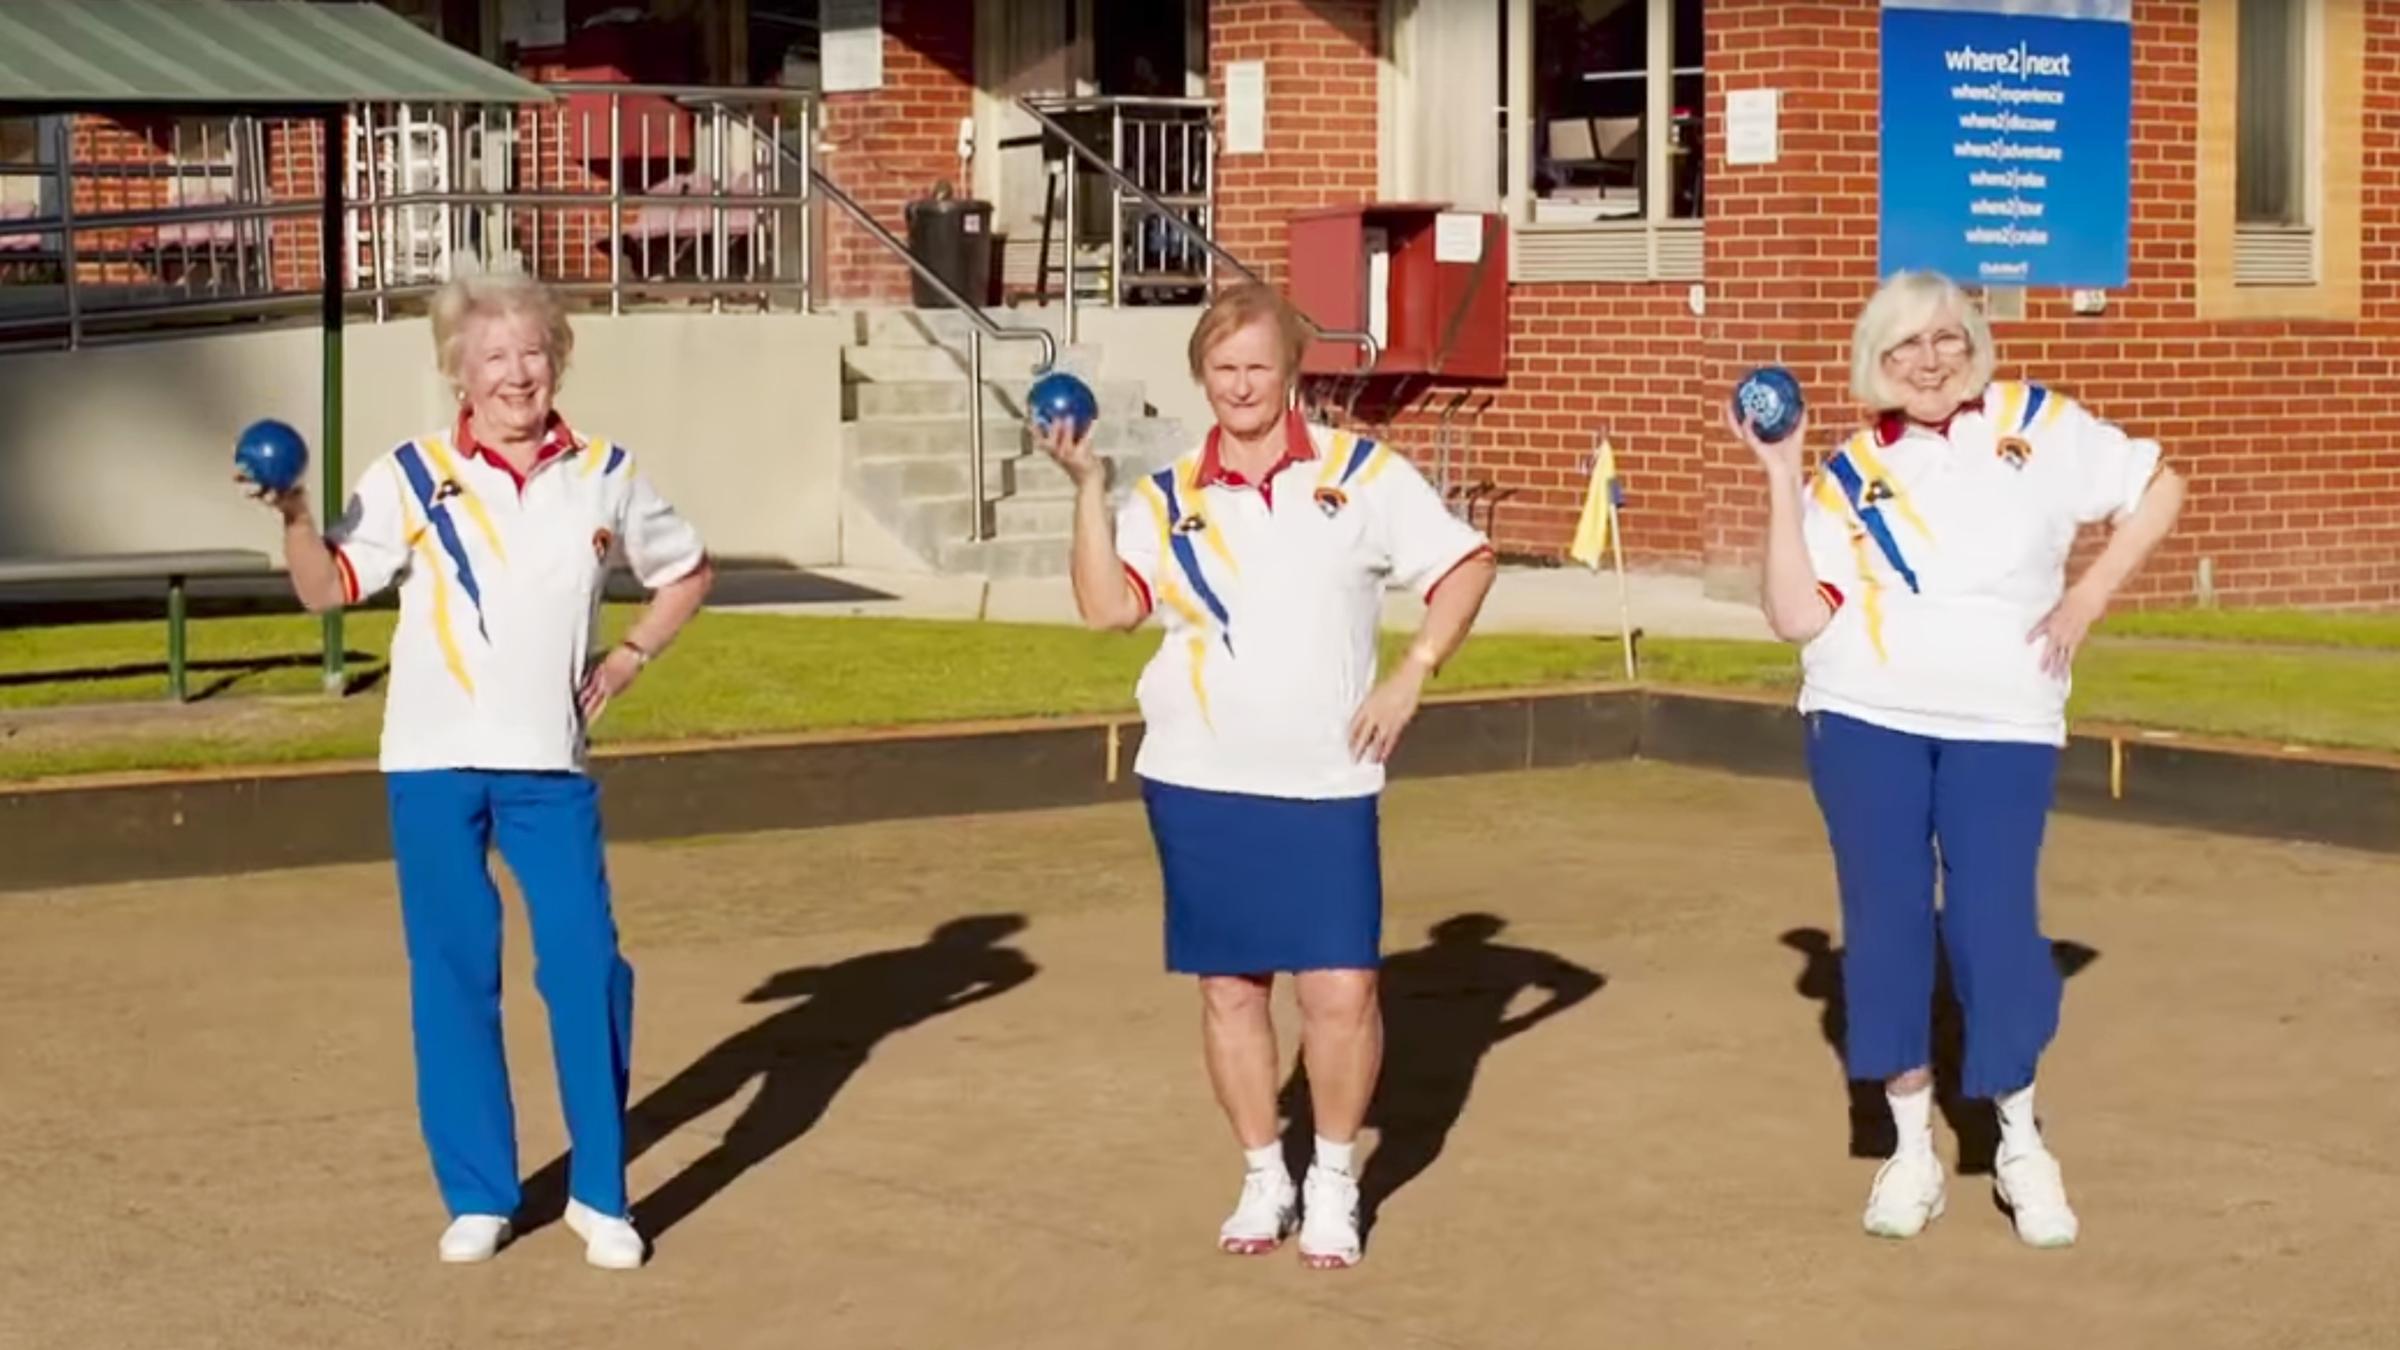 Bowlingladies teaser